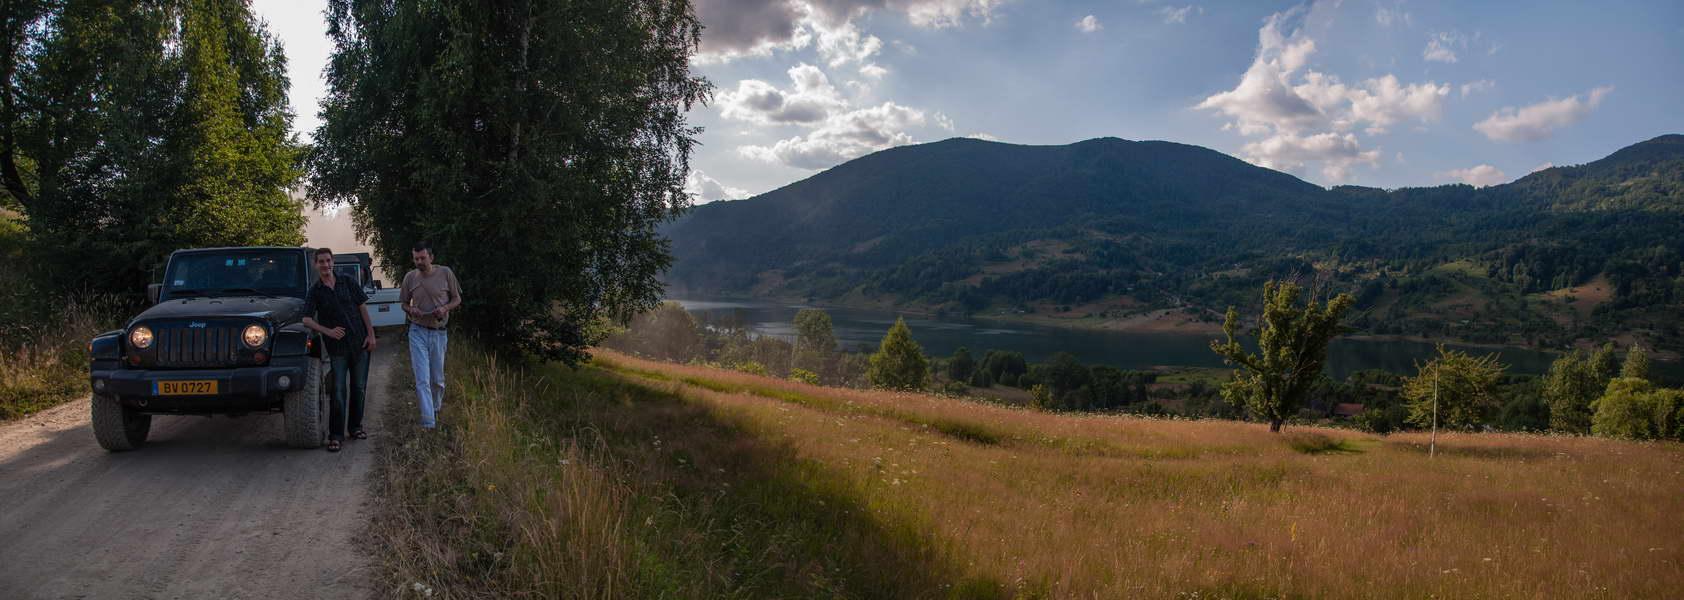 Rumunija_2015_003